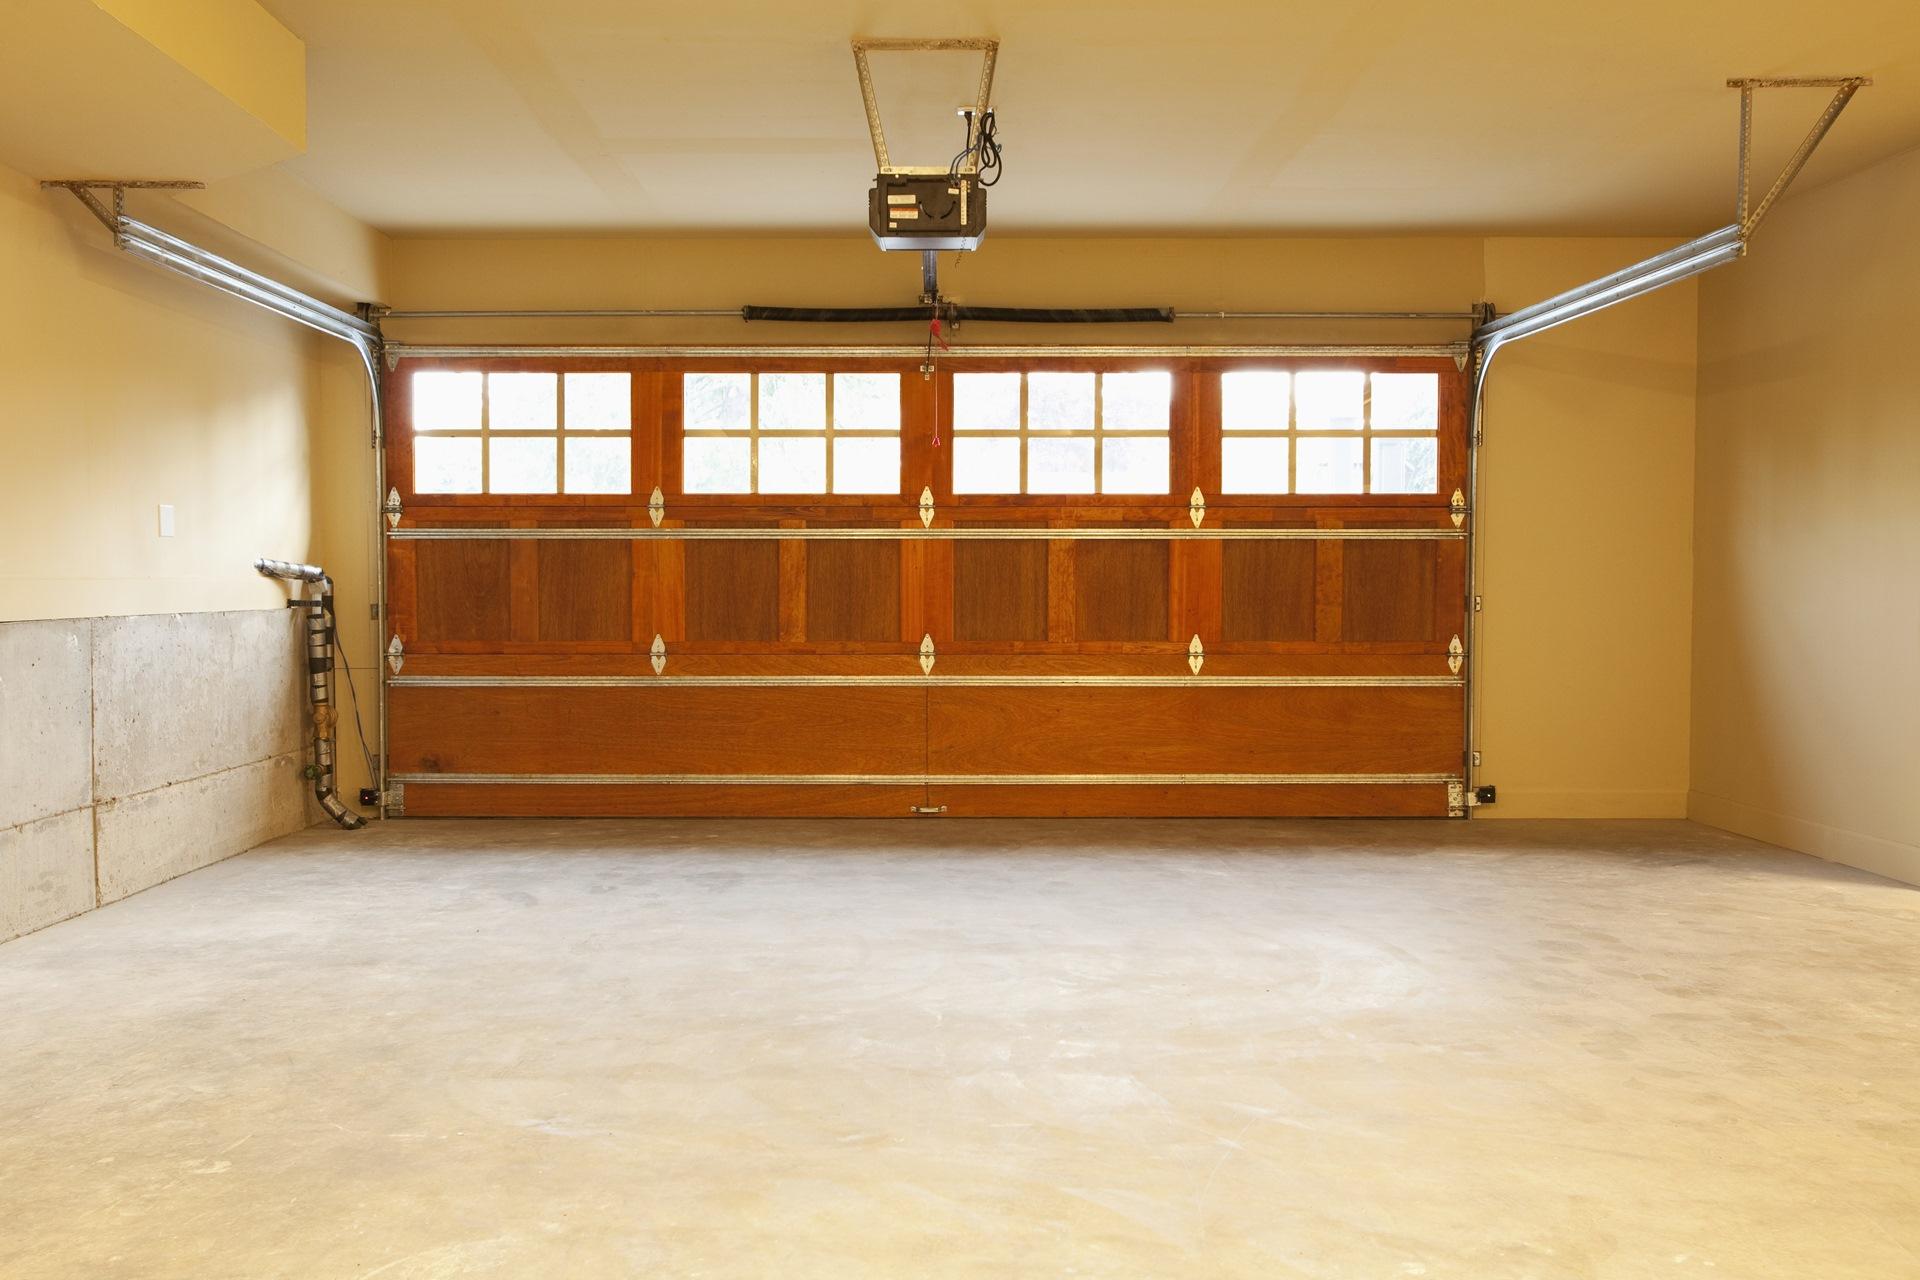 Interior of garage before conversion